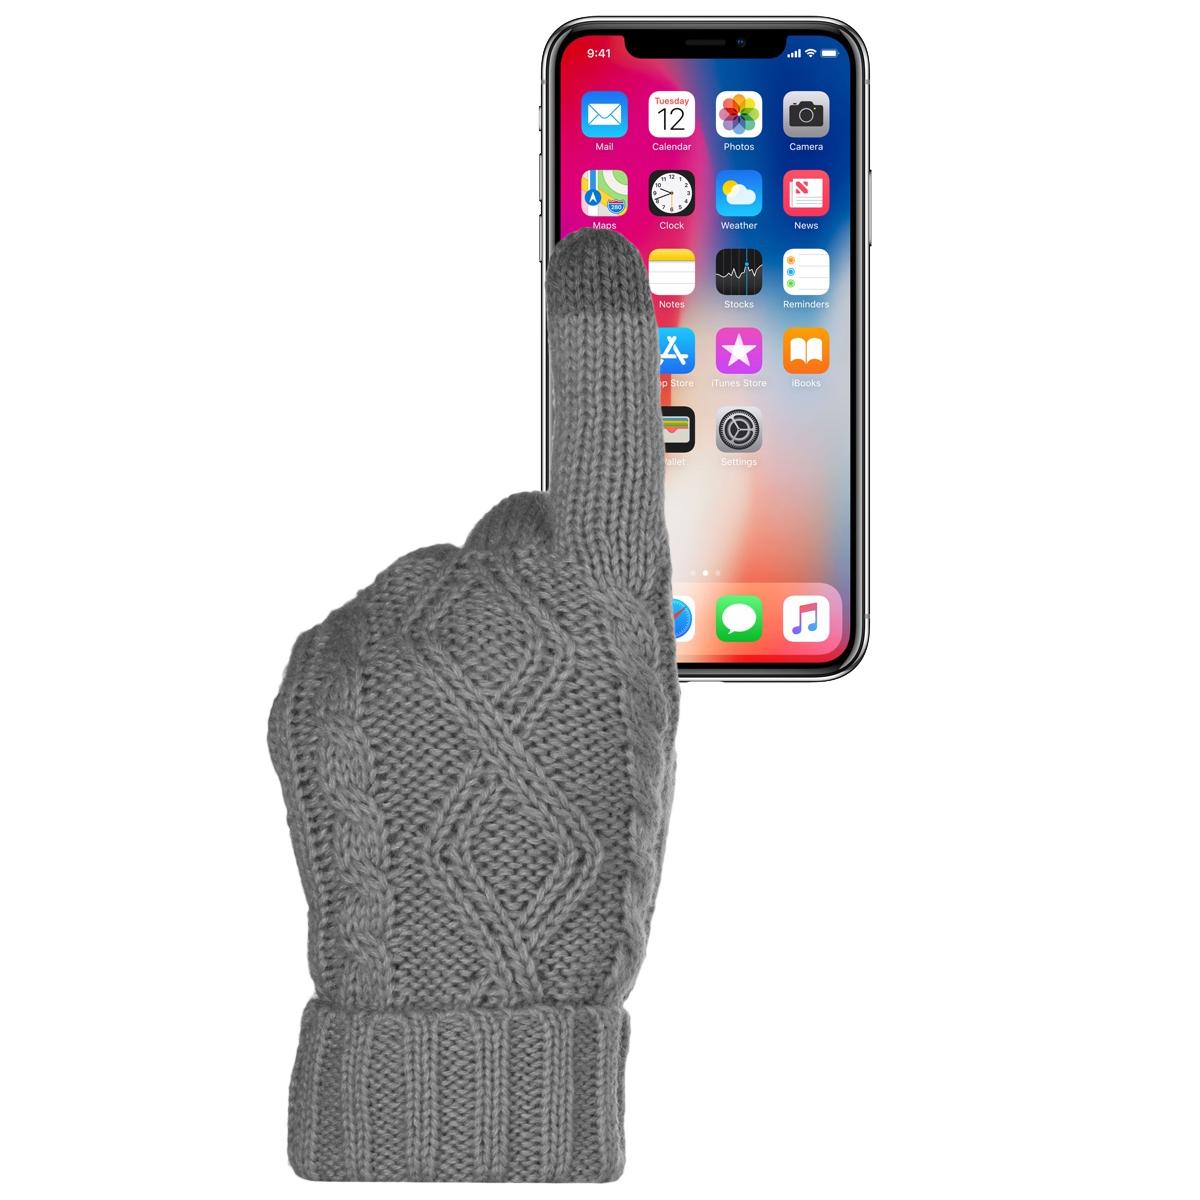 Warm-Cute-Texting-Gloves-Touch-Screen-Gloves-Knit-Gloves-Winter-Gloves-For-Women Indexbild 13